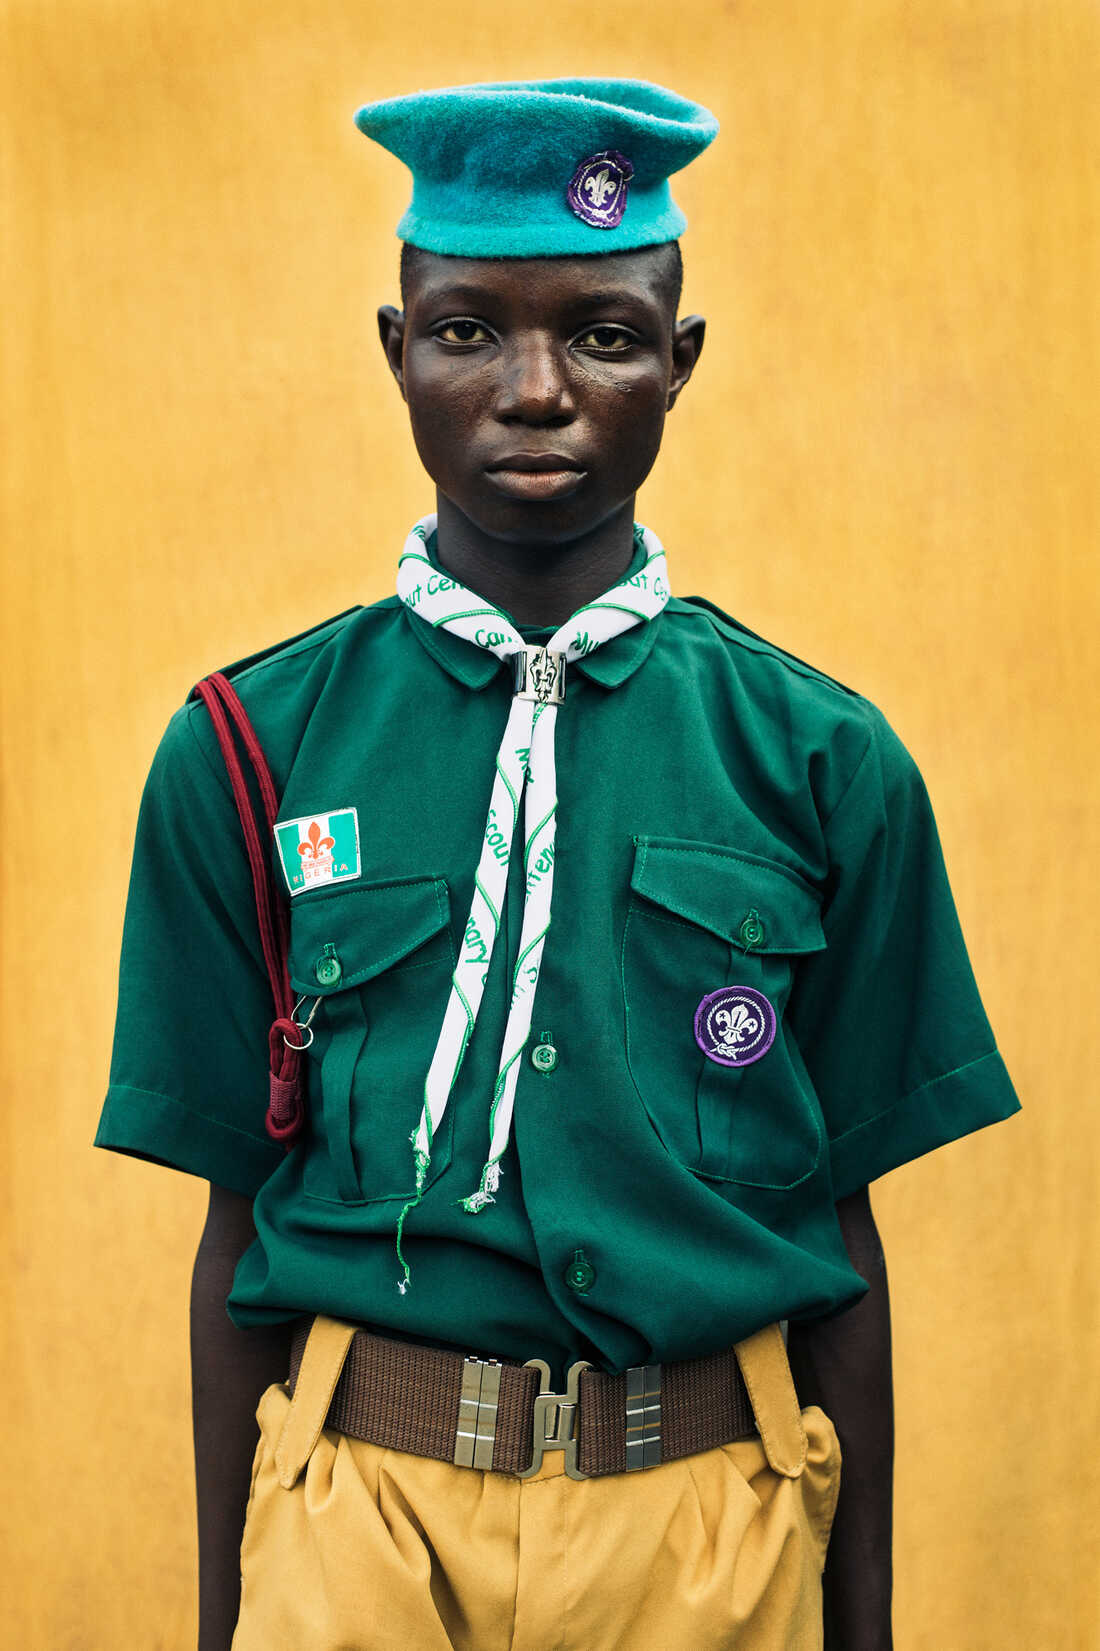 Boy Scout, 2015 © Karl Ohiri and Riikka Kassinen